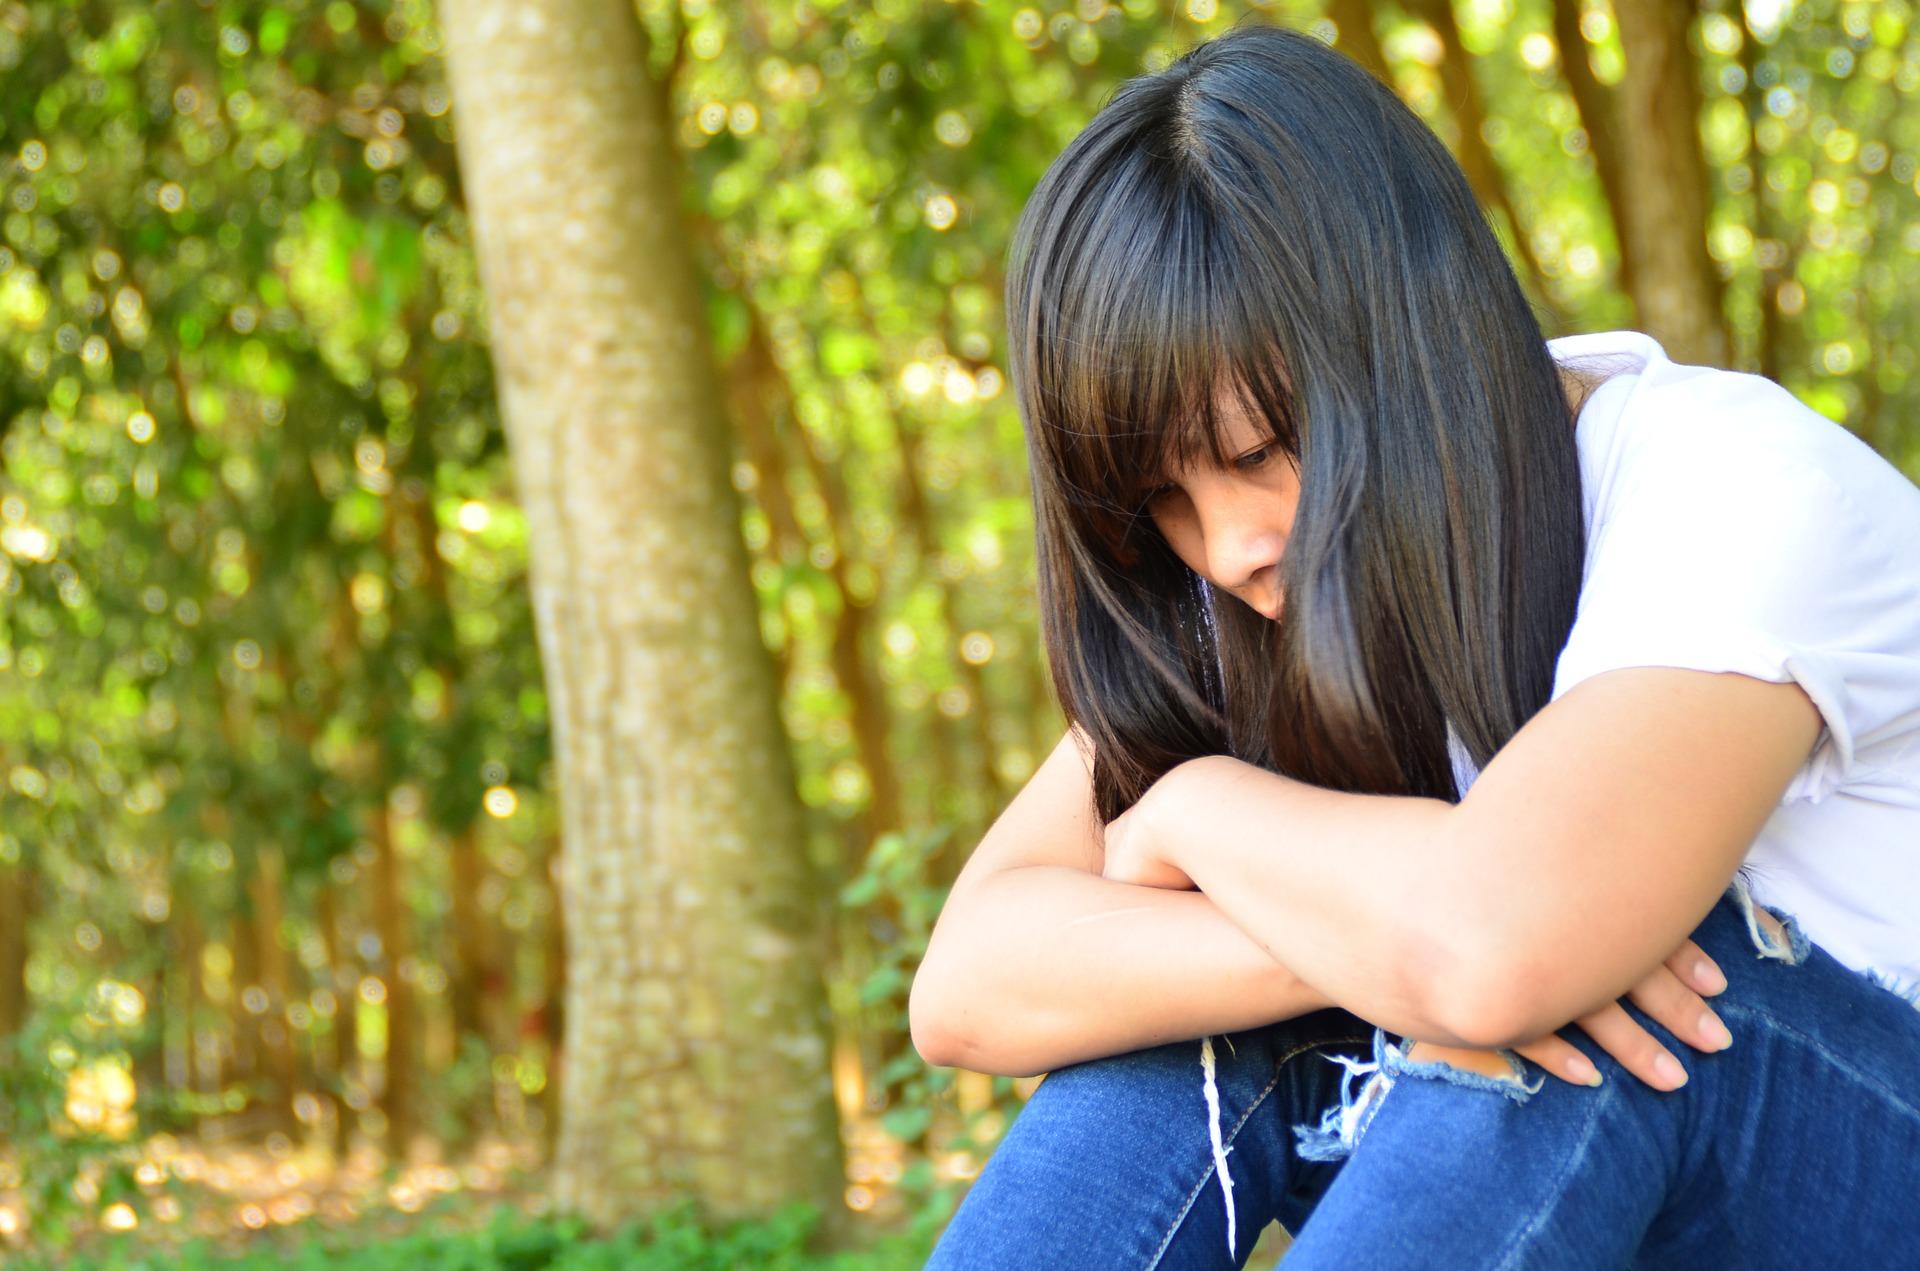 Effects of Ketamine Abuse